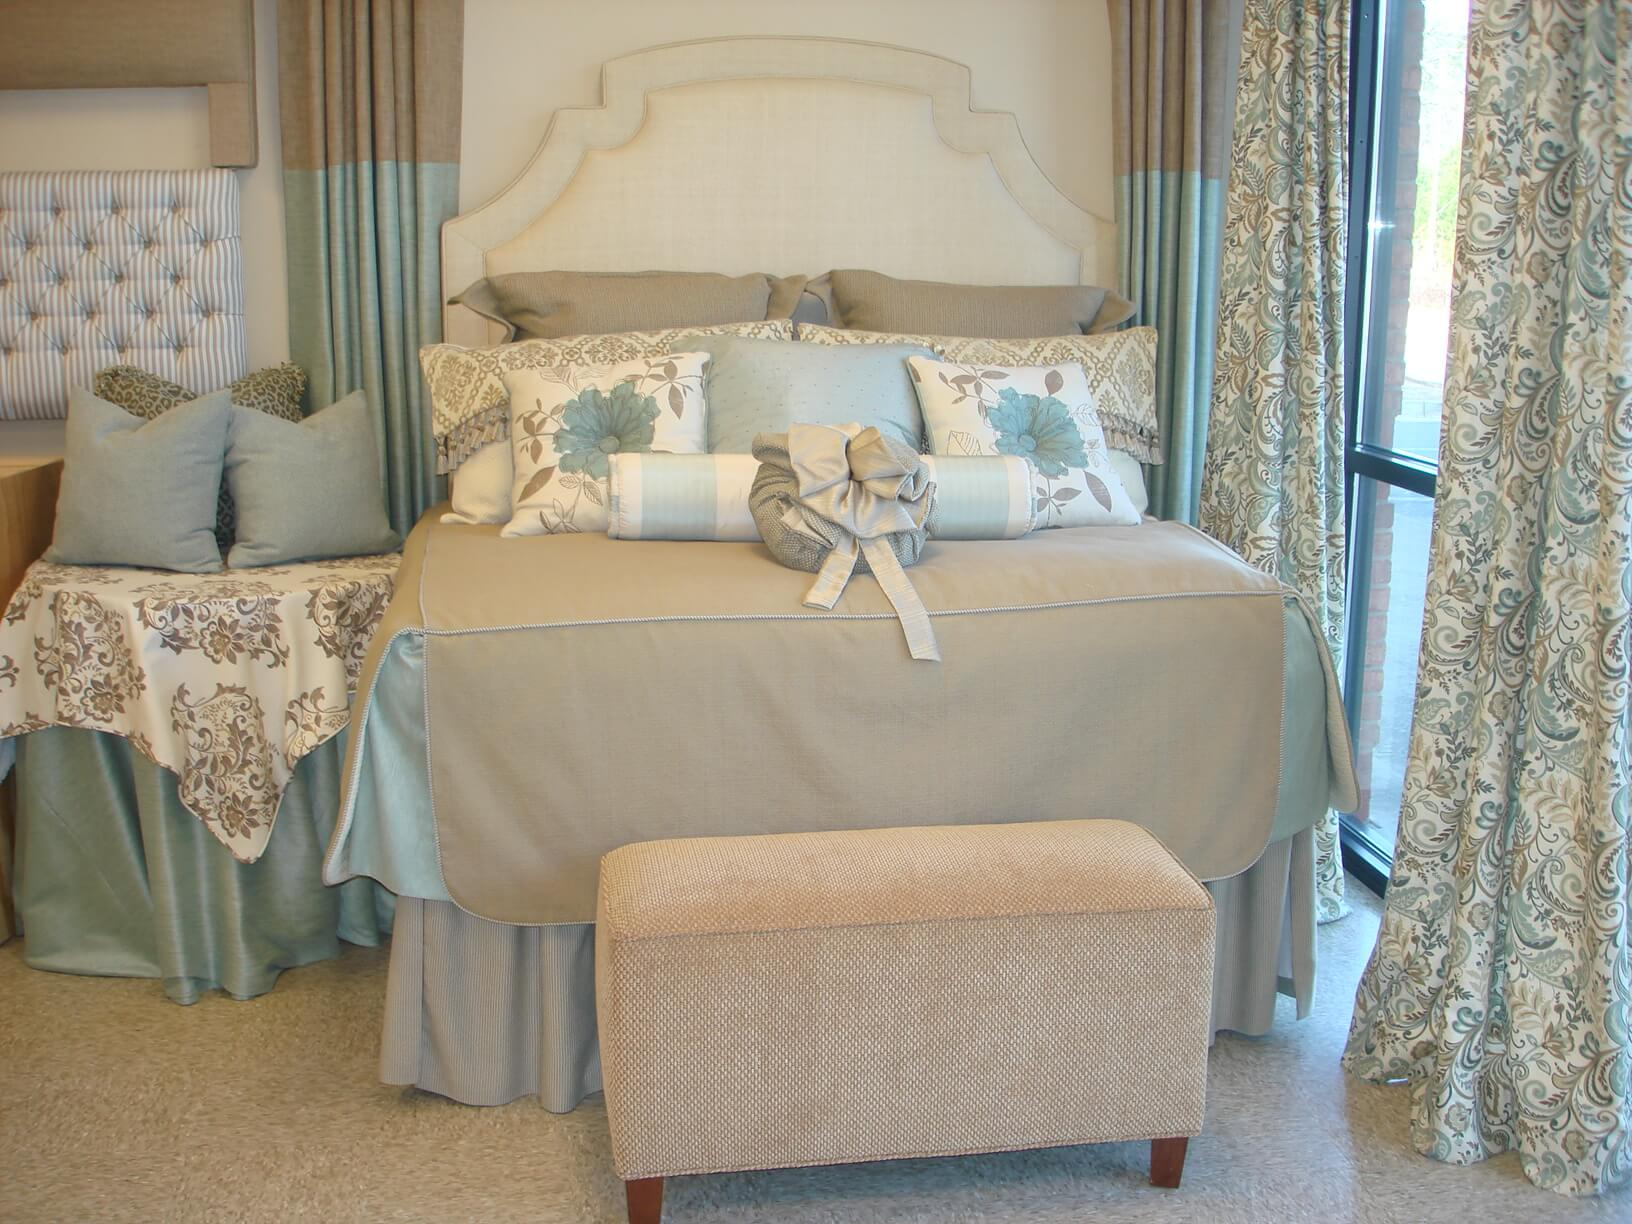 custom-bedding-linens-fabric-atlanta-georgia.JPG